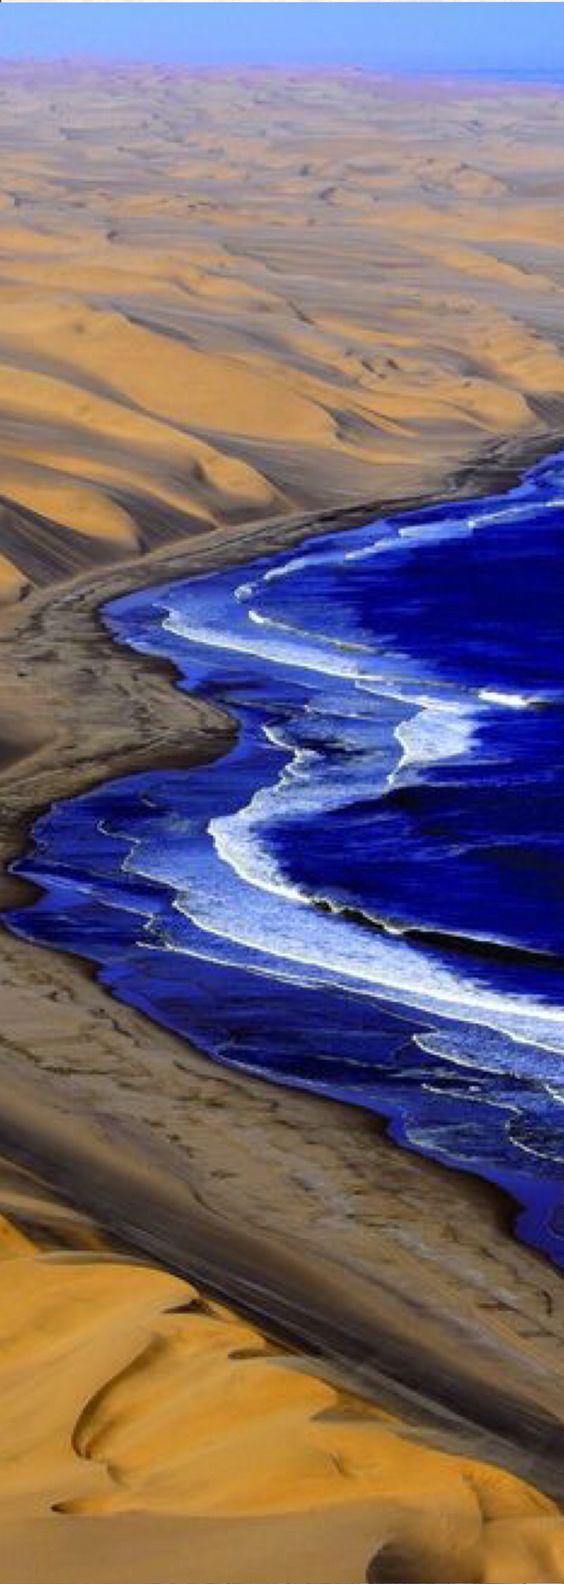 Sea and desert. Namib desert in Namibia Africa